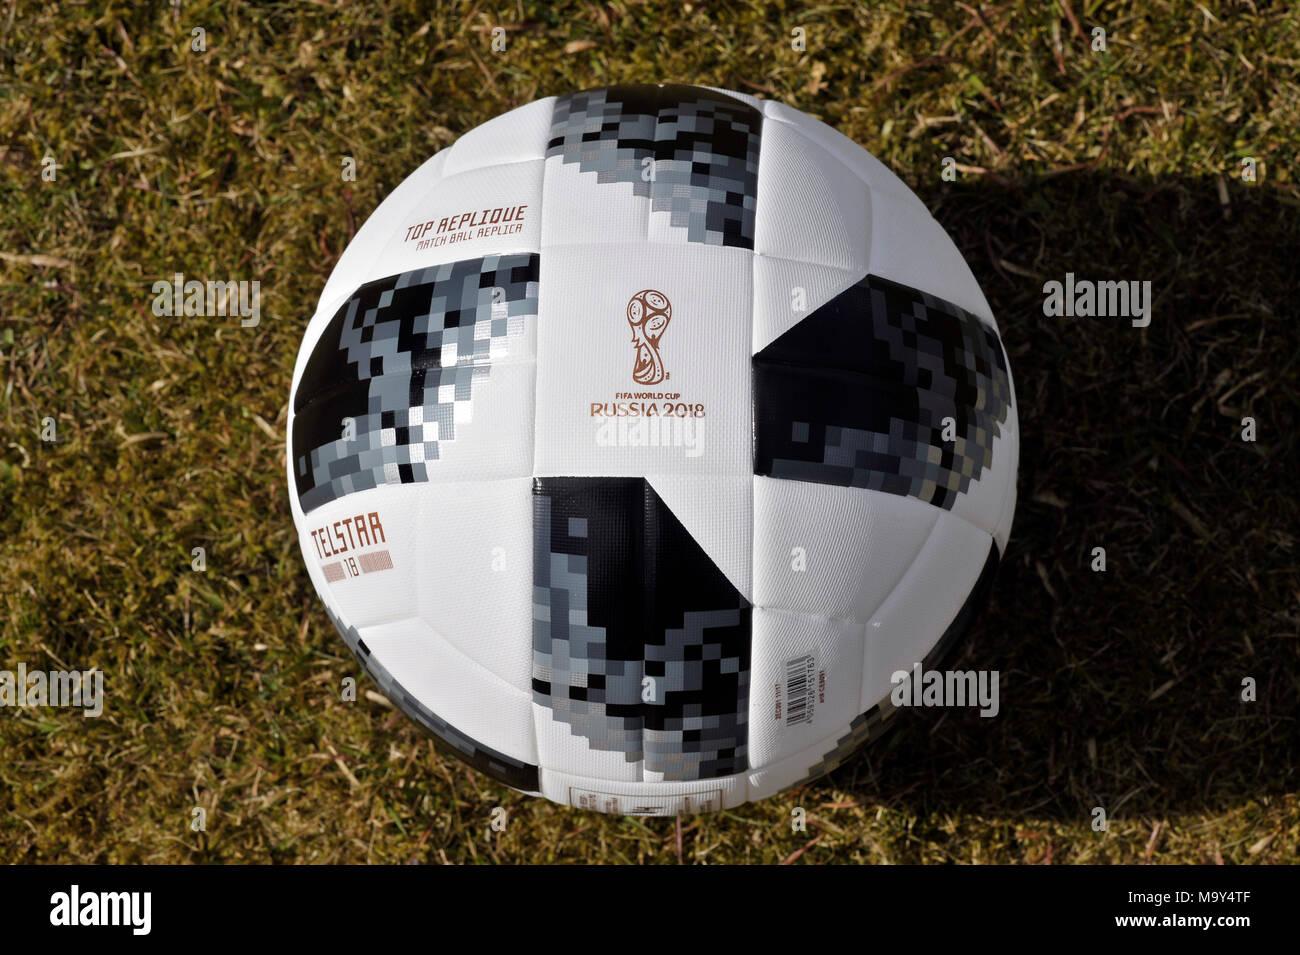 Adidas Telstar Fussball Wm 2018 Stockfoto Bild 178232111